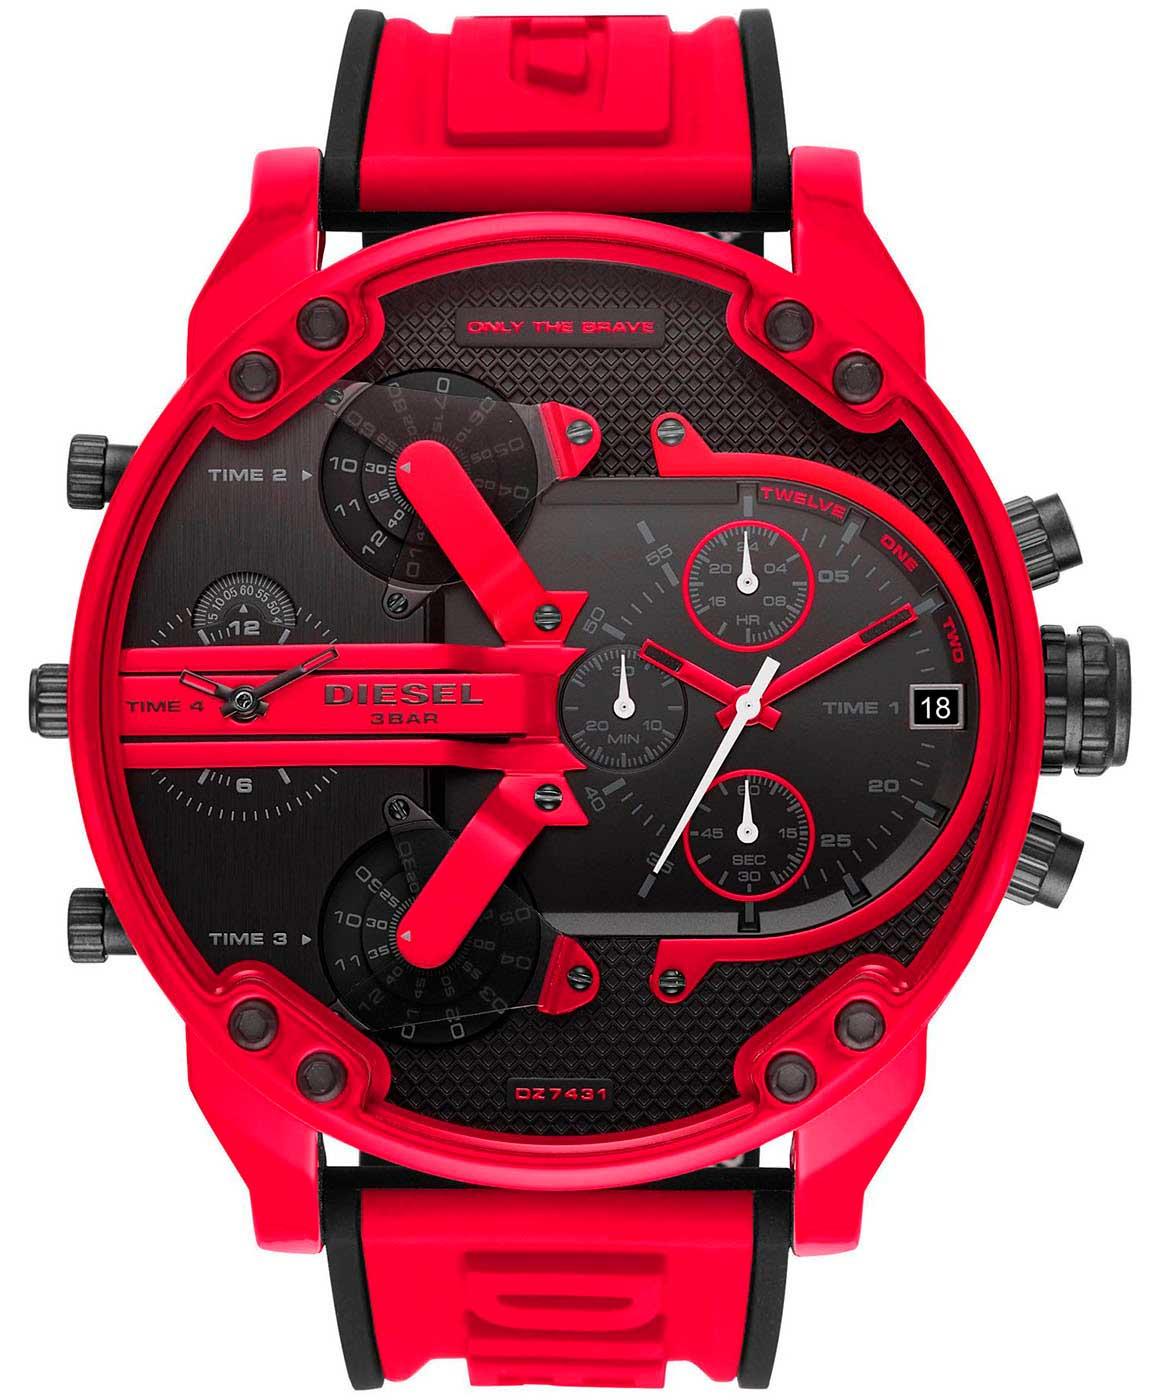 Мужские часы Diesel DZ7431 мужские часы diesel dz4446